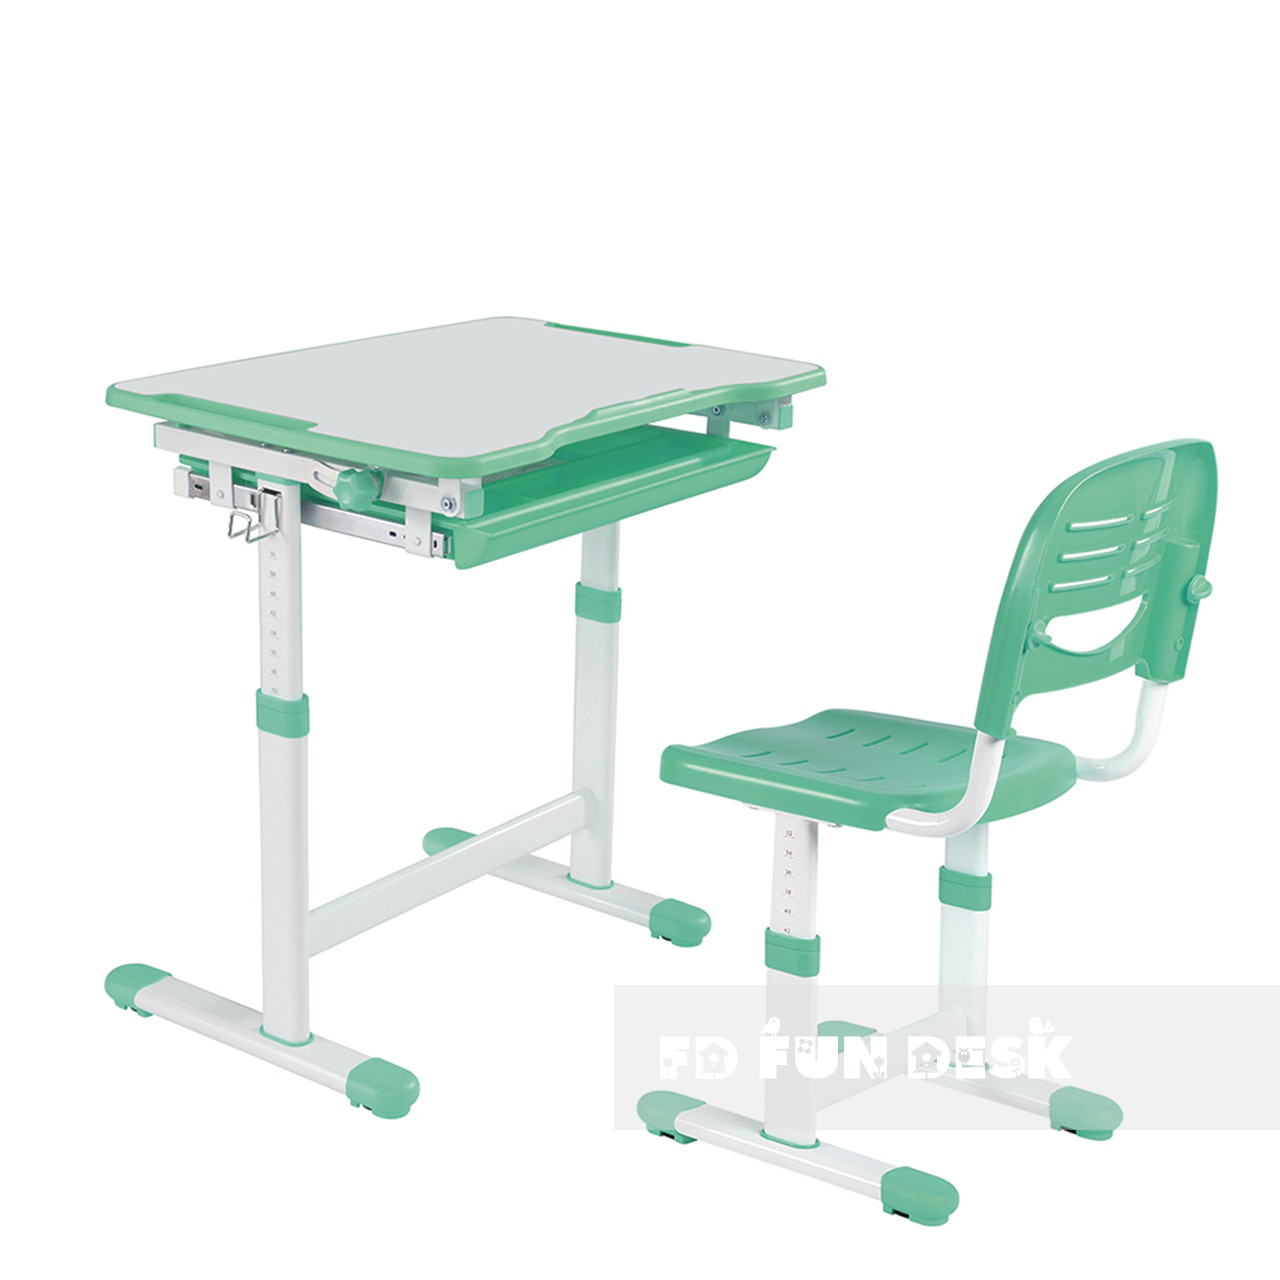 Дитяча парта зі стільцем Piccolino Green FunDesk